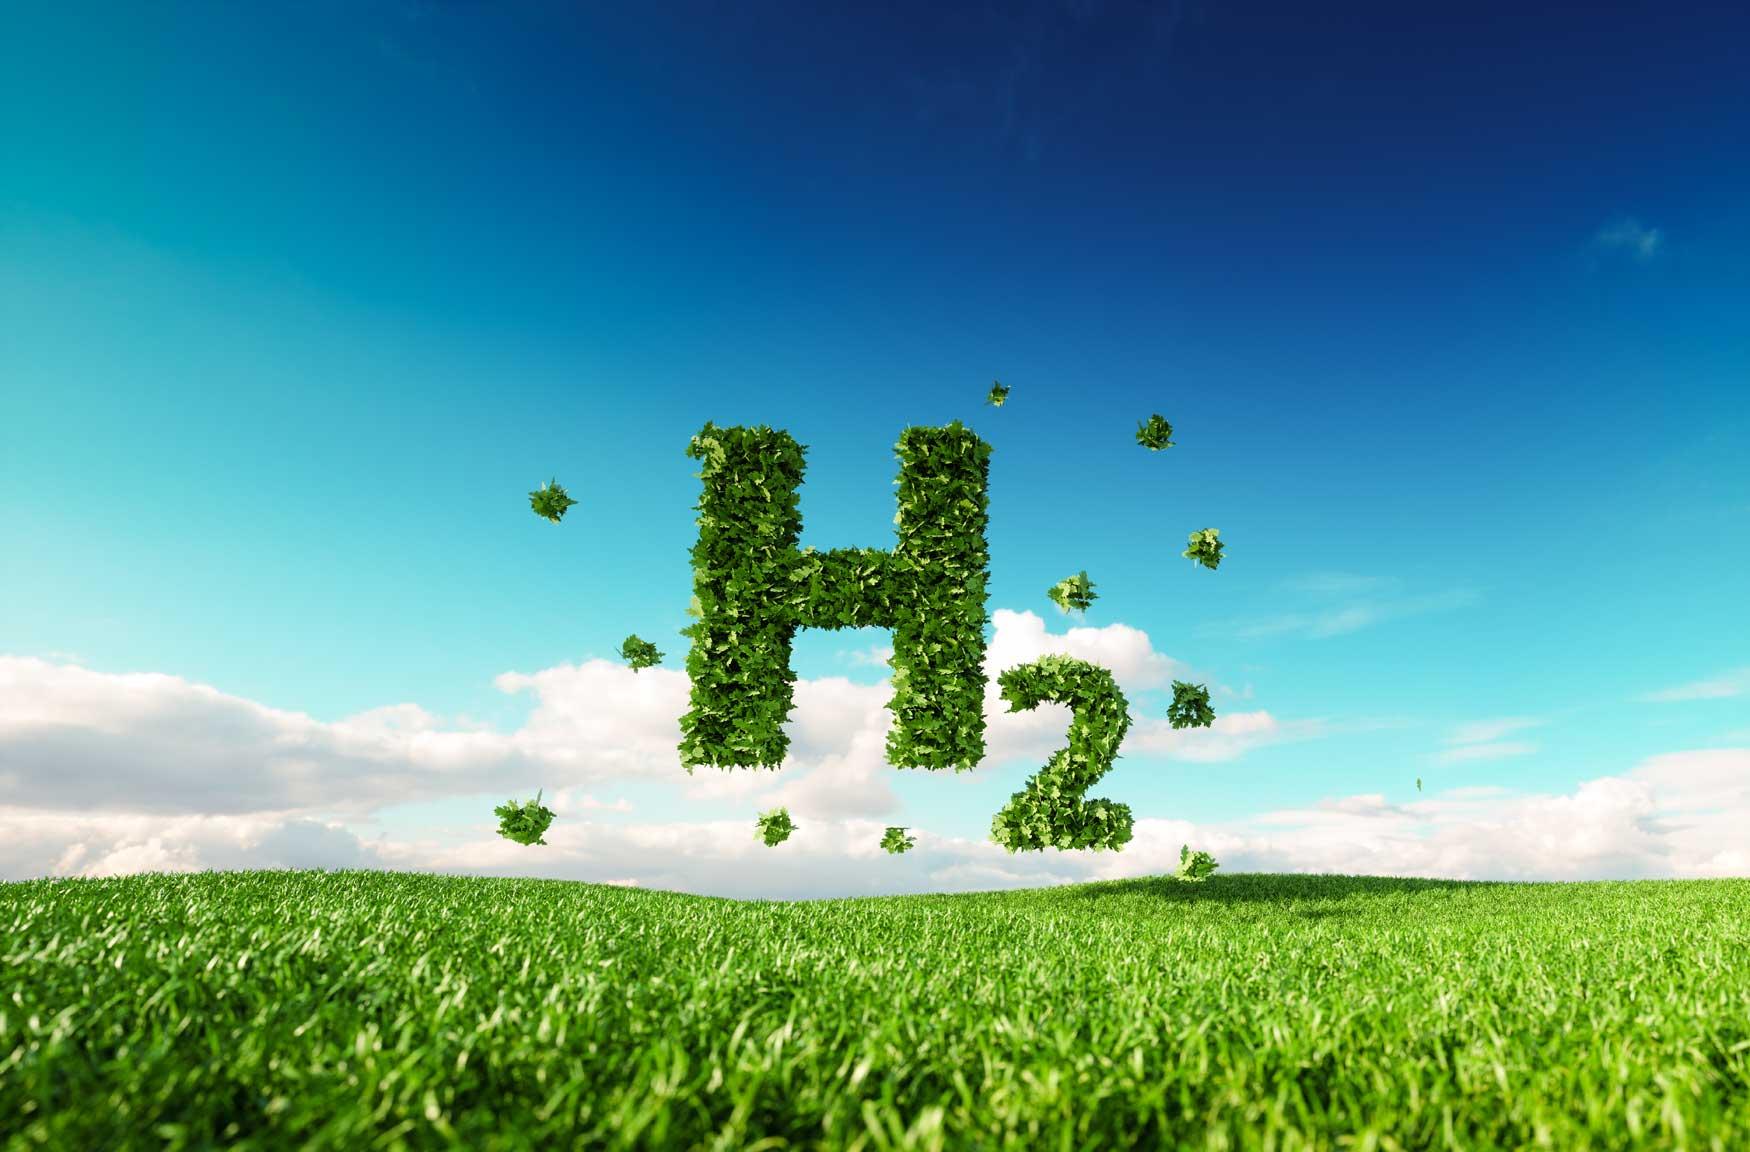 hidrogenio iStock 959895446